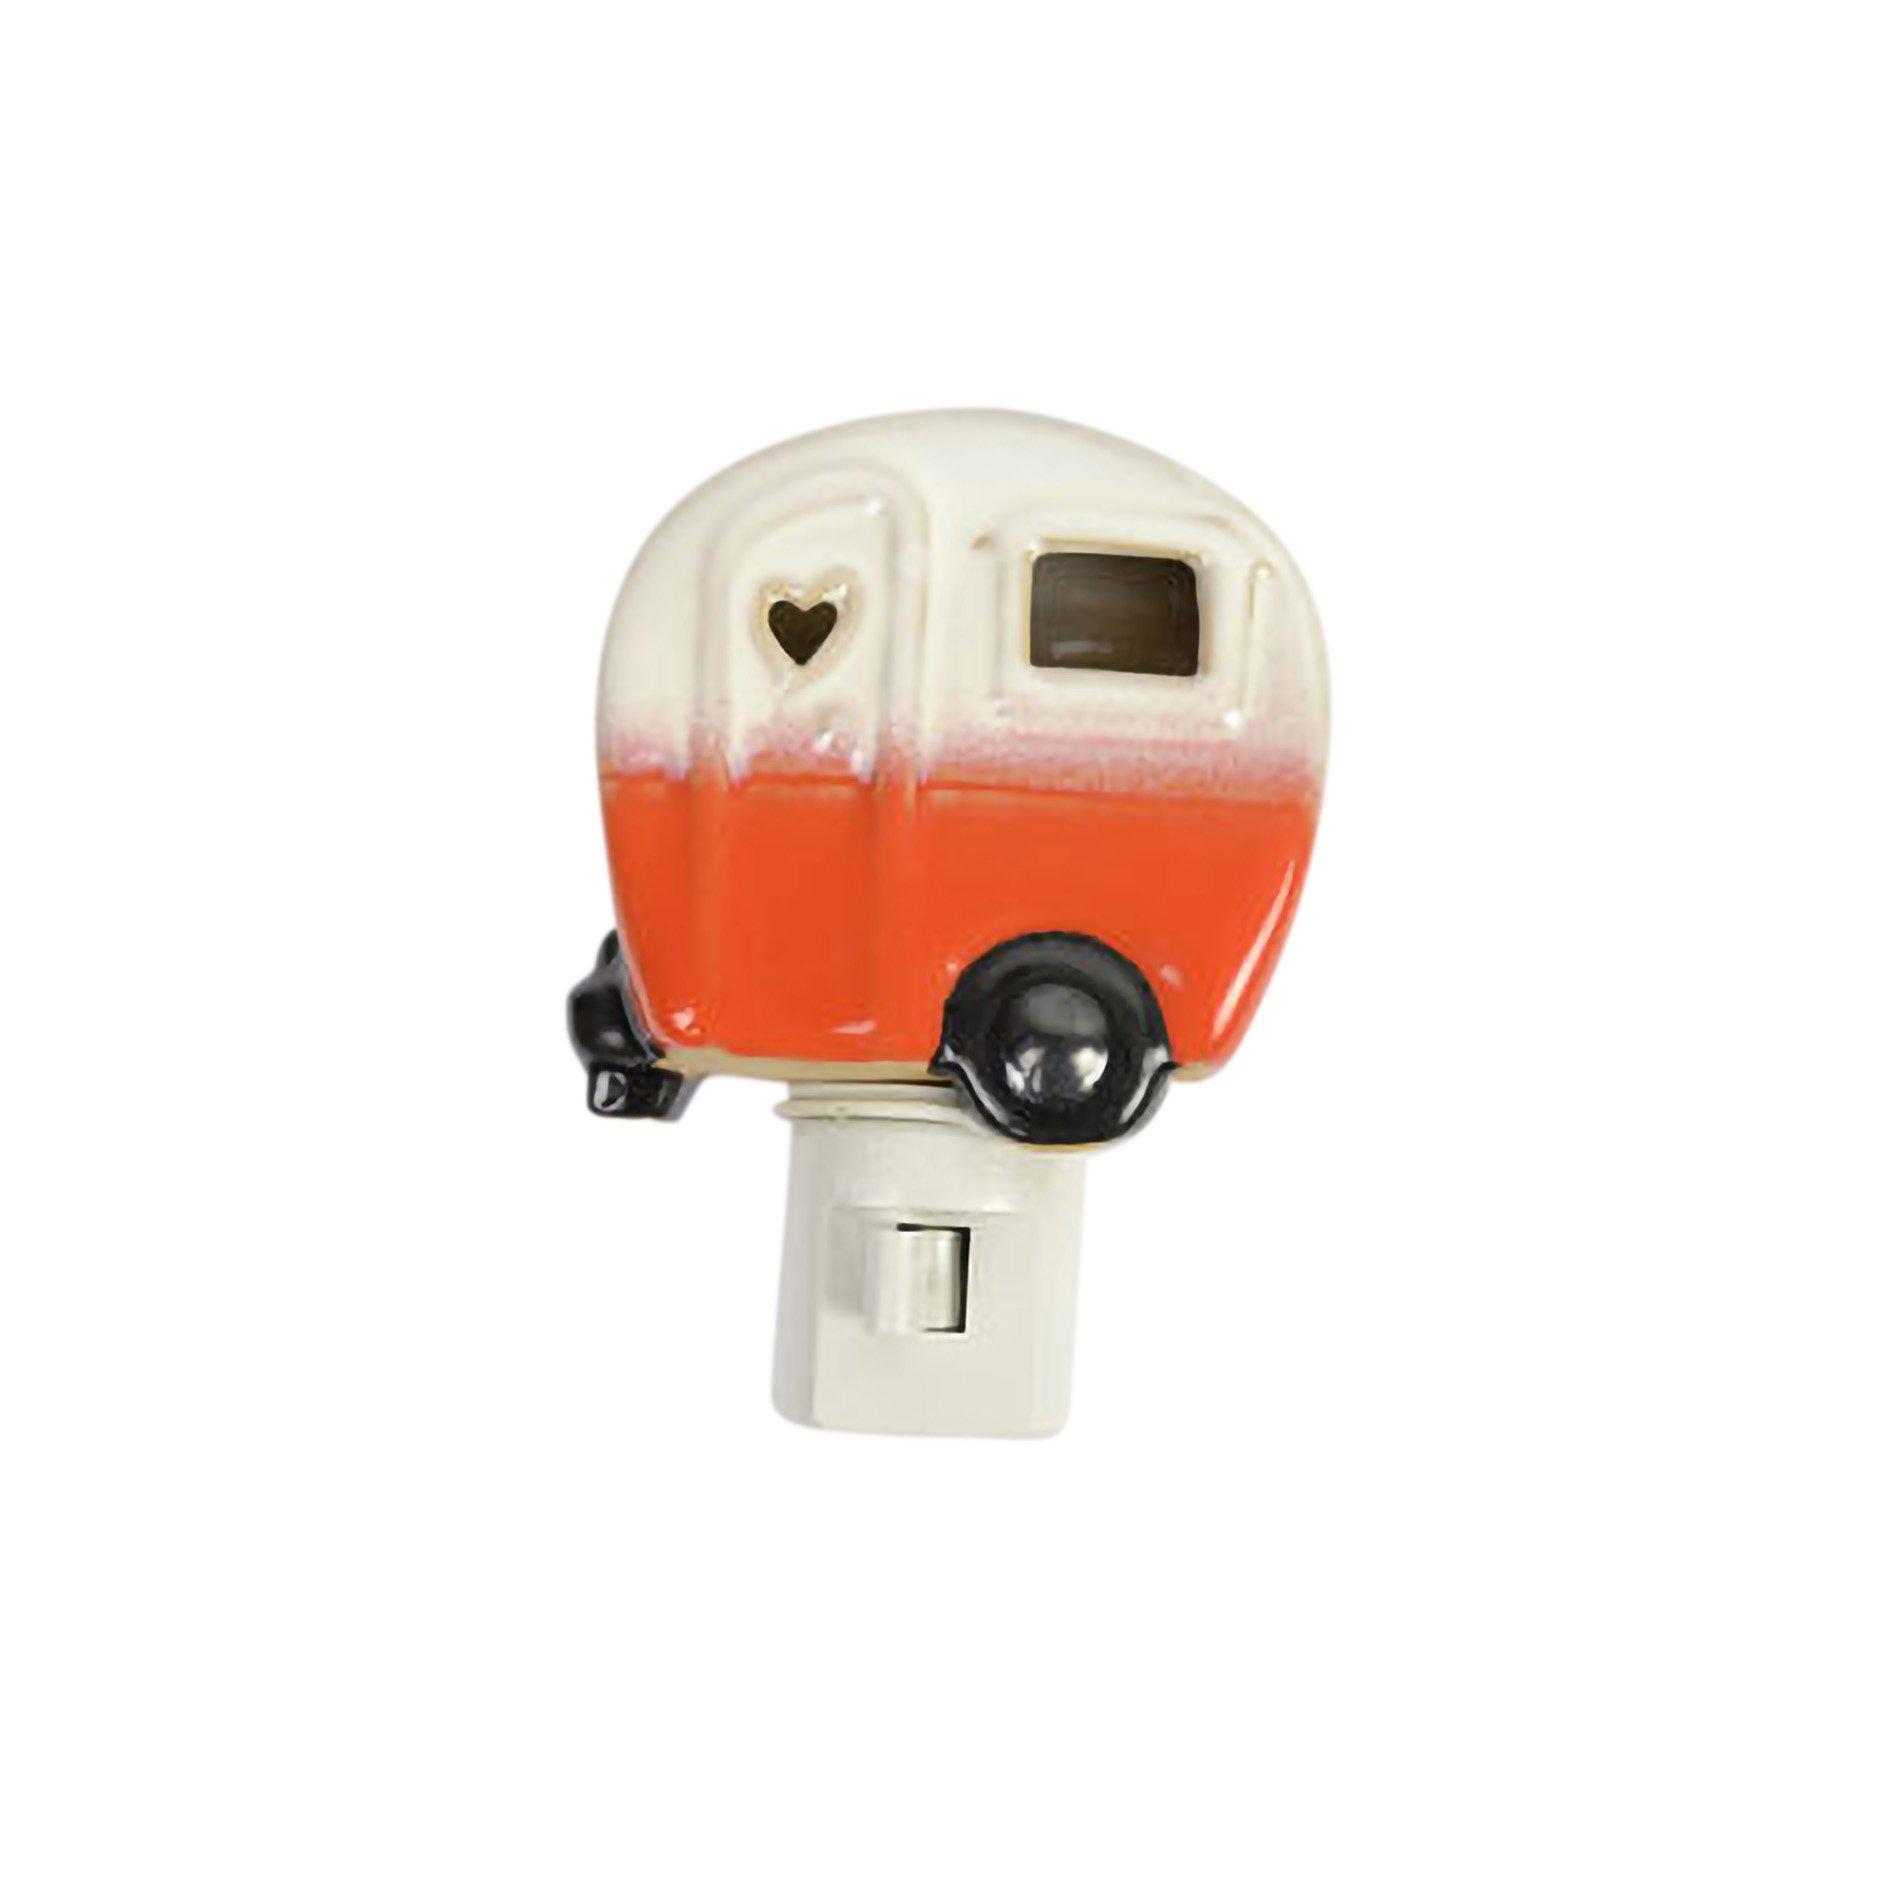 Drew Derose Glossy Orange Whimsical Camper RV Heart 7 x 4 Ceramic Night Light by Drew Derose (Image #1)